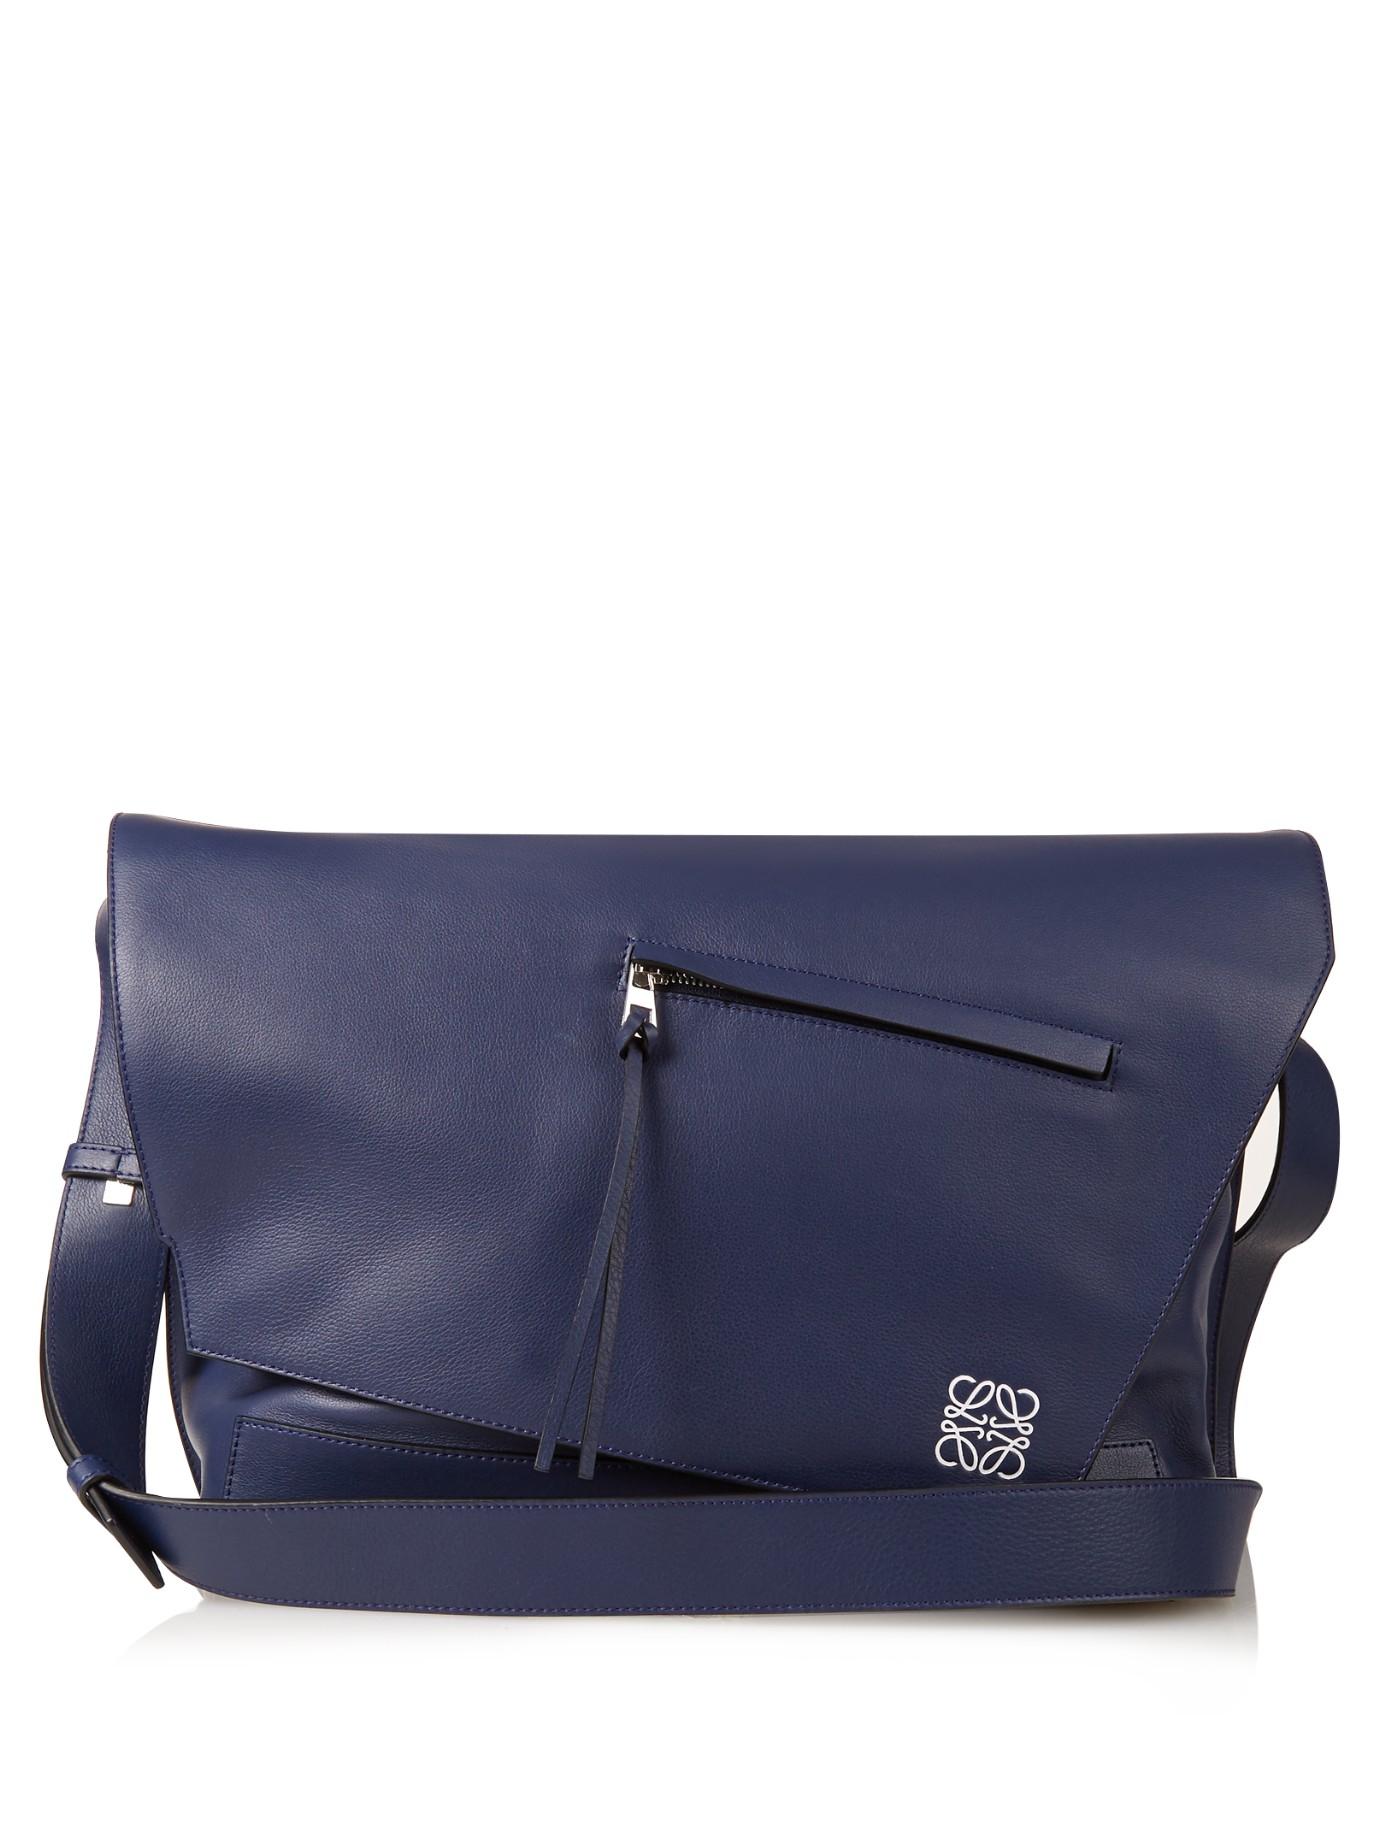 Loewe Anton Leather Messenger Bag In Blue For Men Lyst